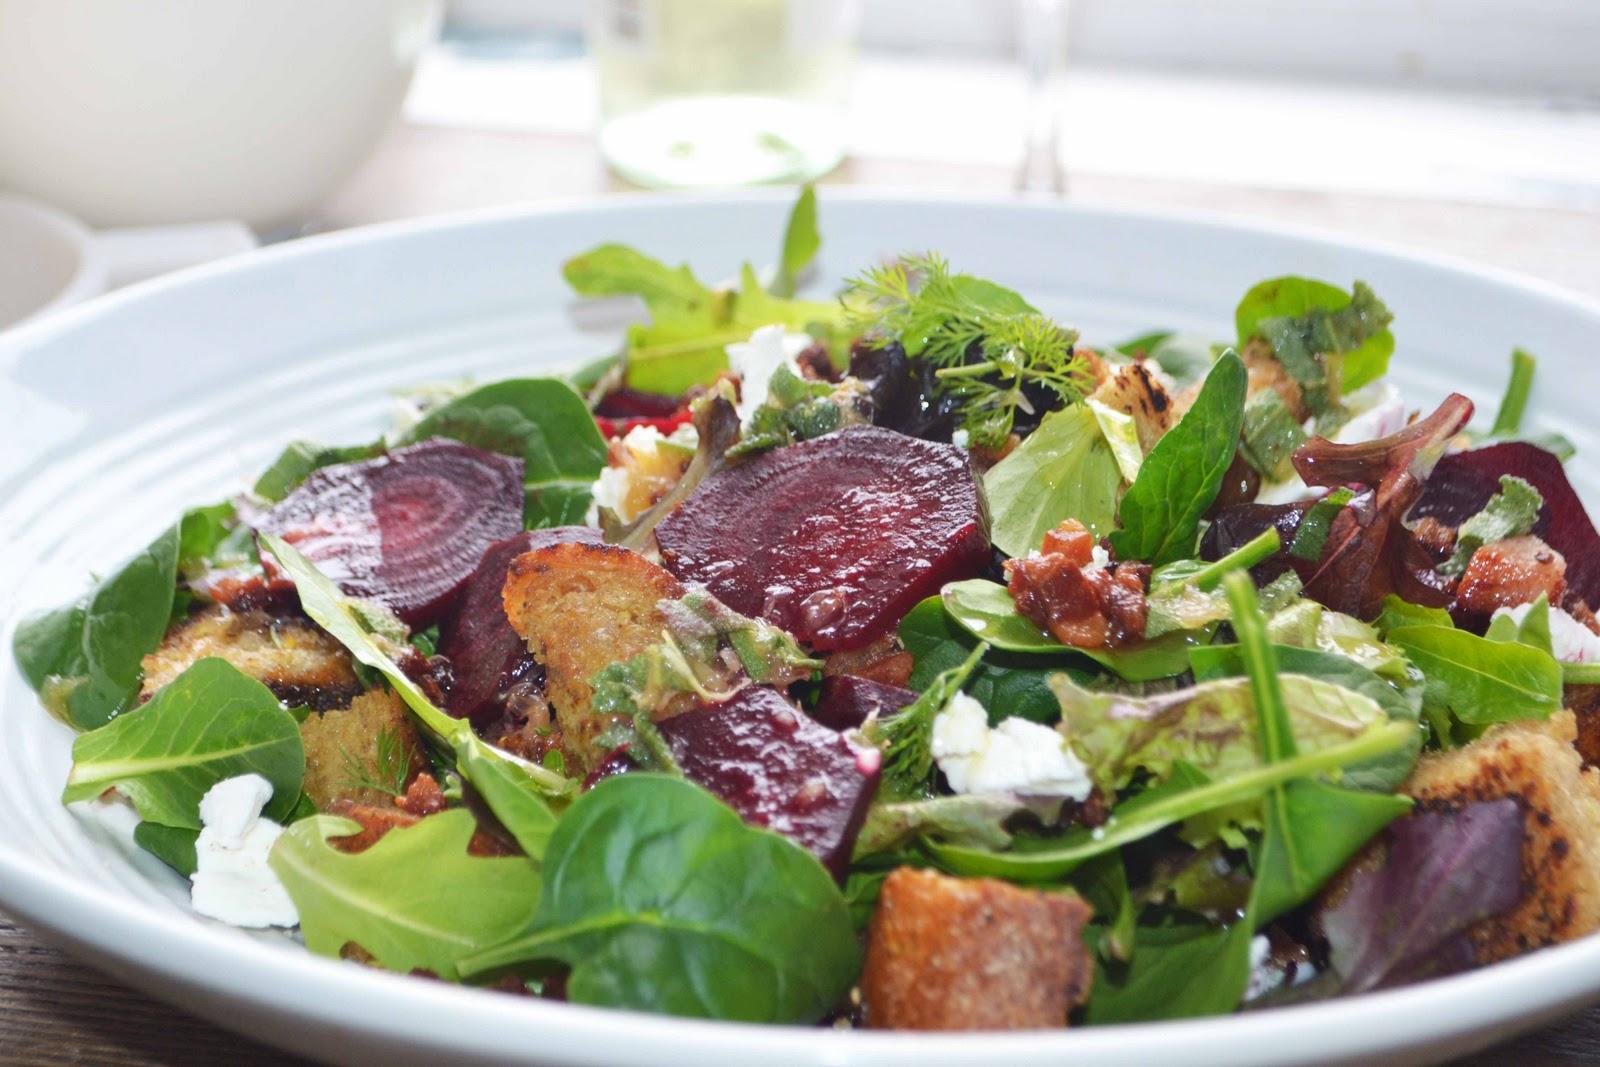 Winter Panzanella Salad/ My FIRST Guest Post!